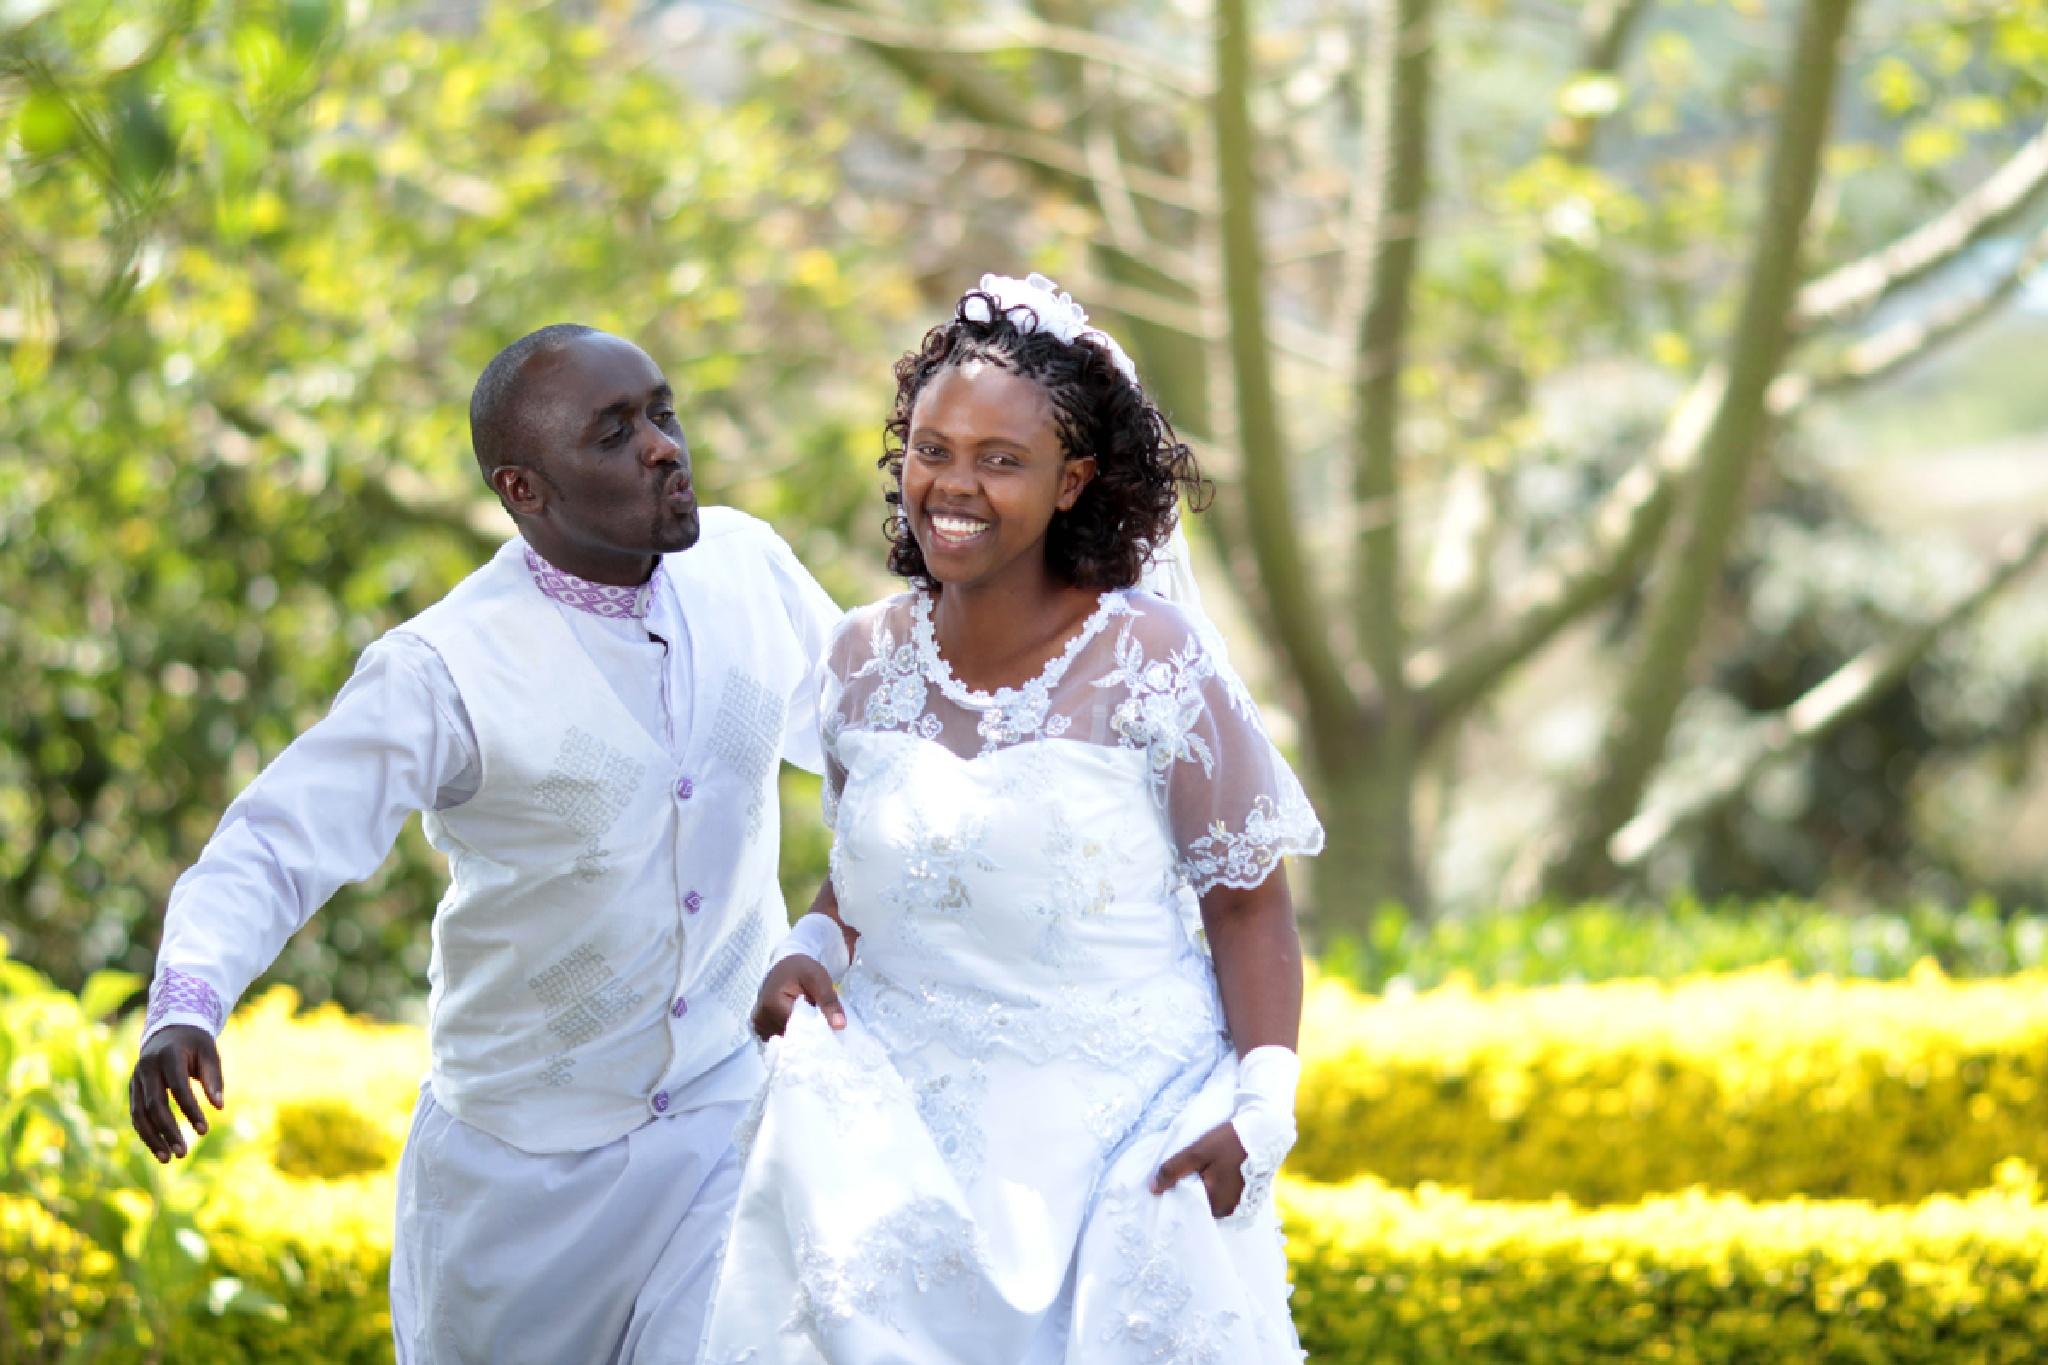 KENYA WEDDING PHOTOGRAPHER by Antony Trivet